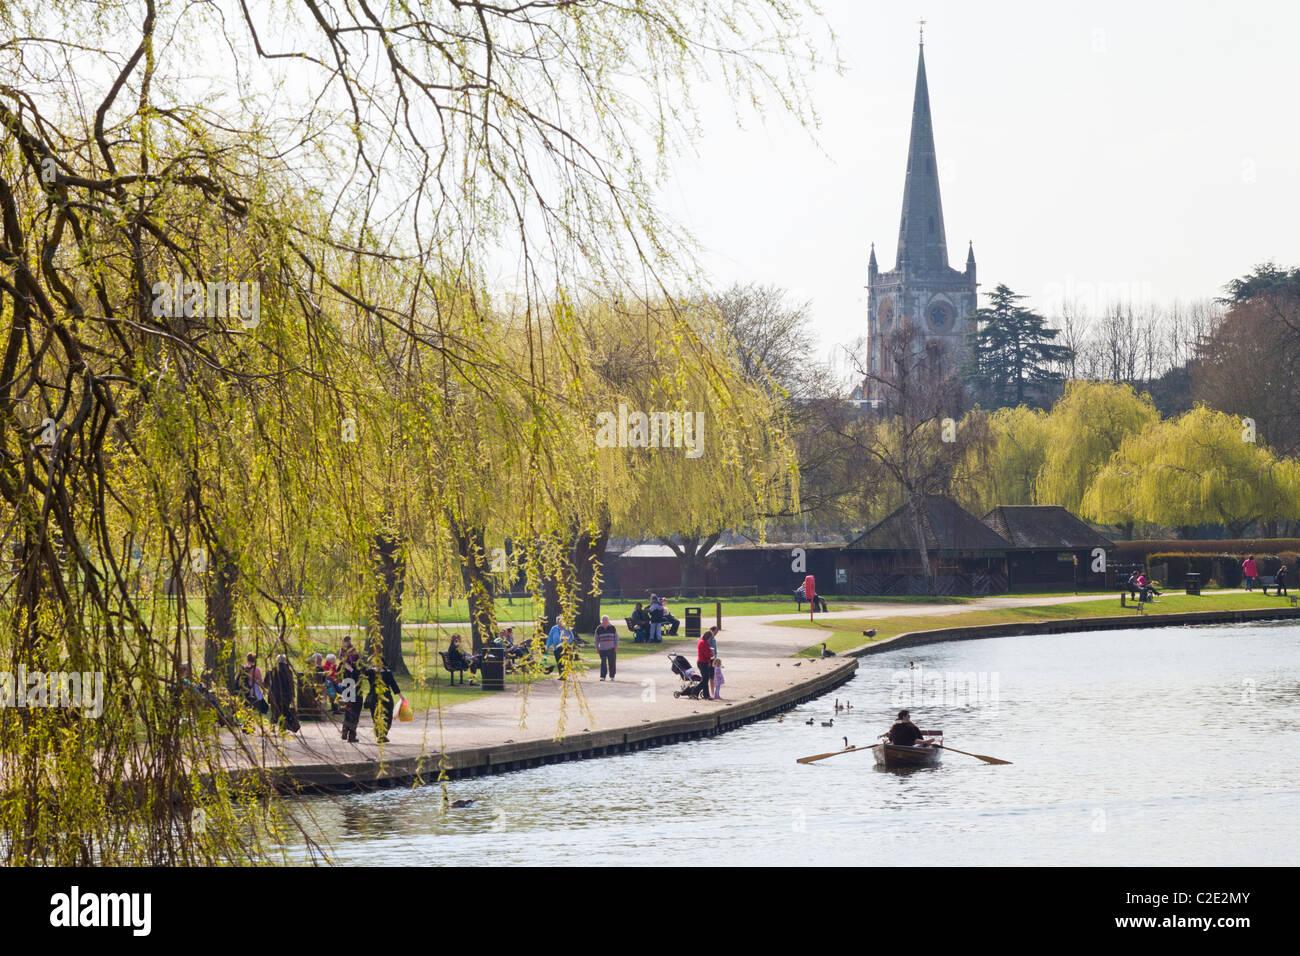 Looking down the River Avon towards Holy Trinity church, Stratford upon Avon, Warwickshire, England, UK Stock Photo